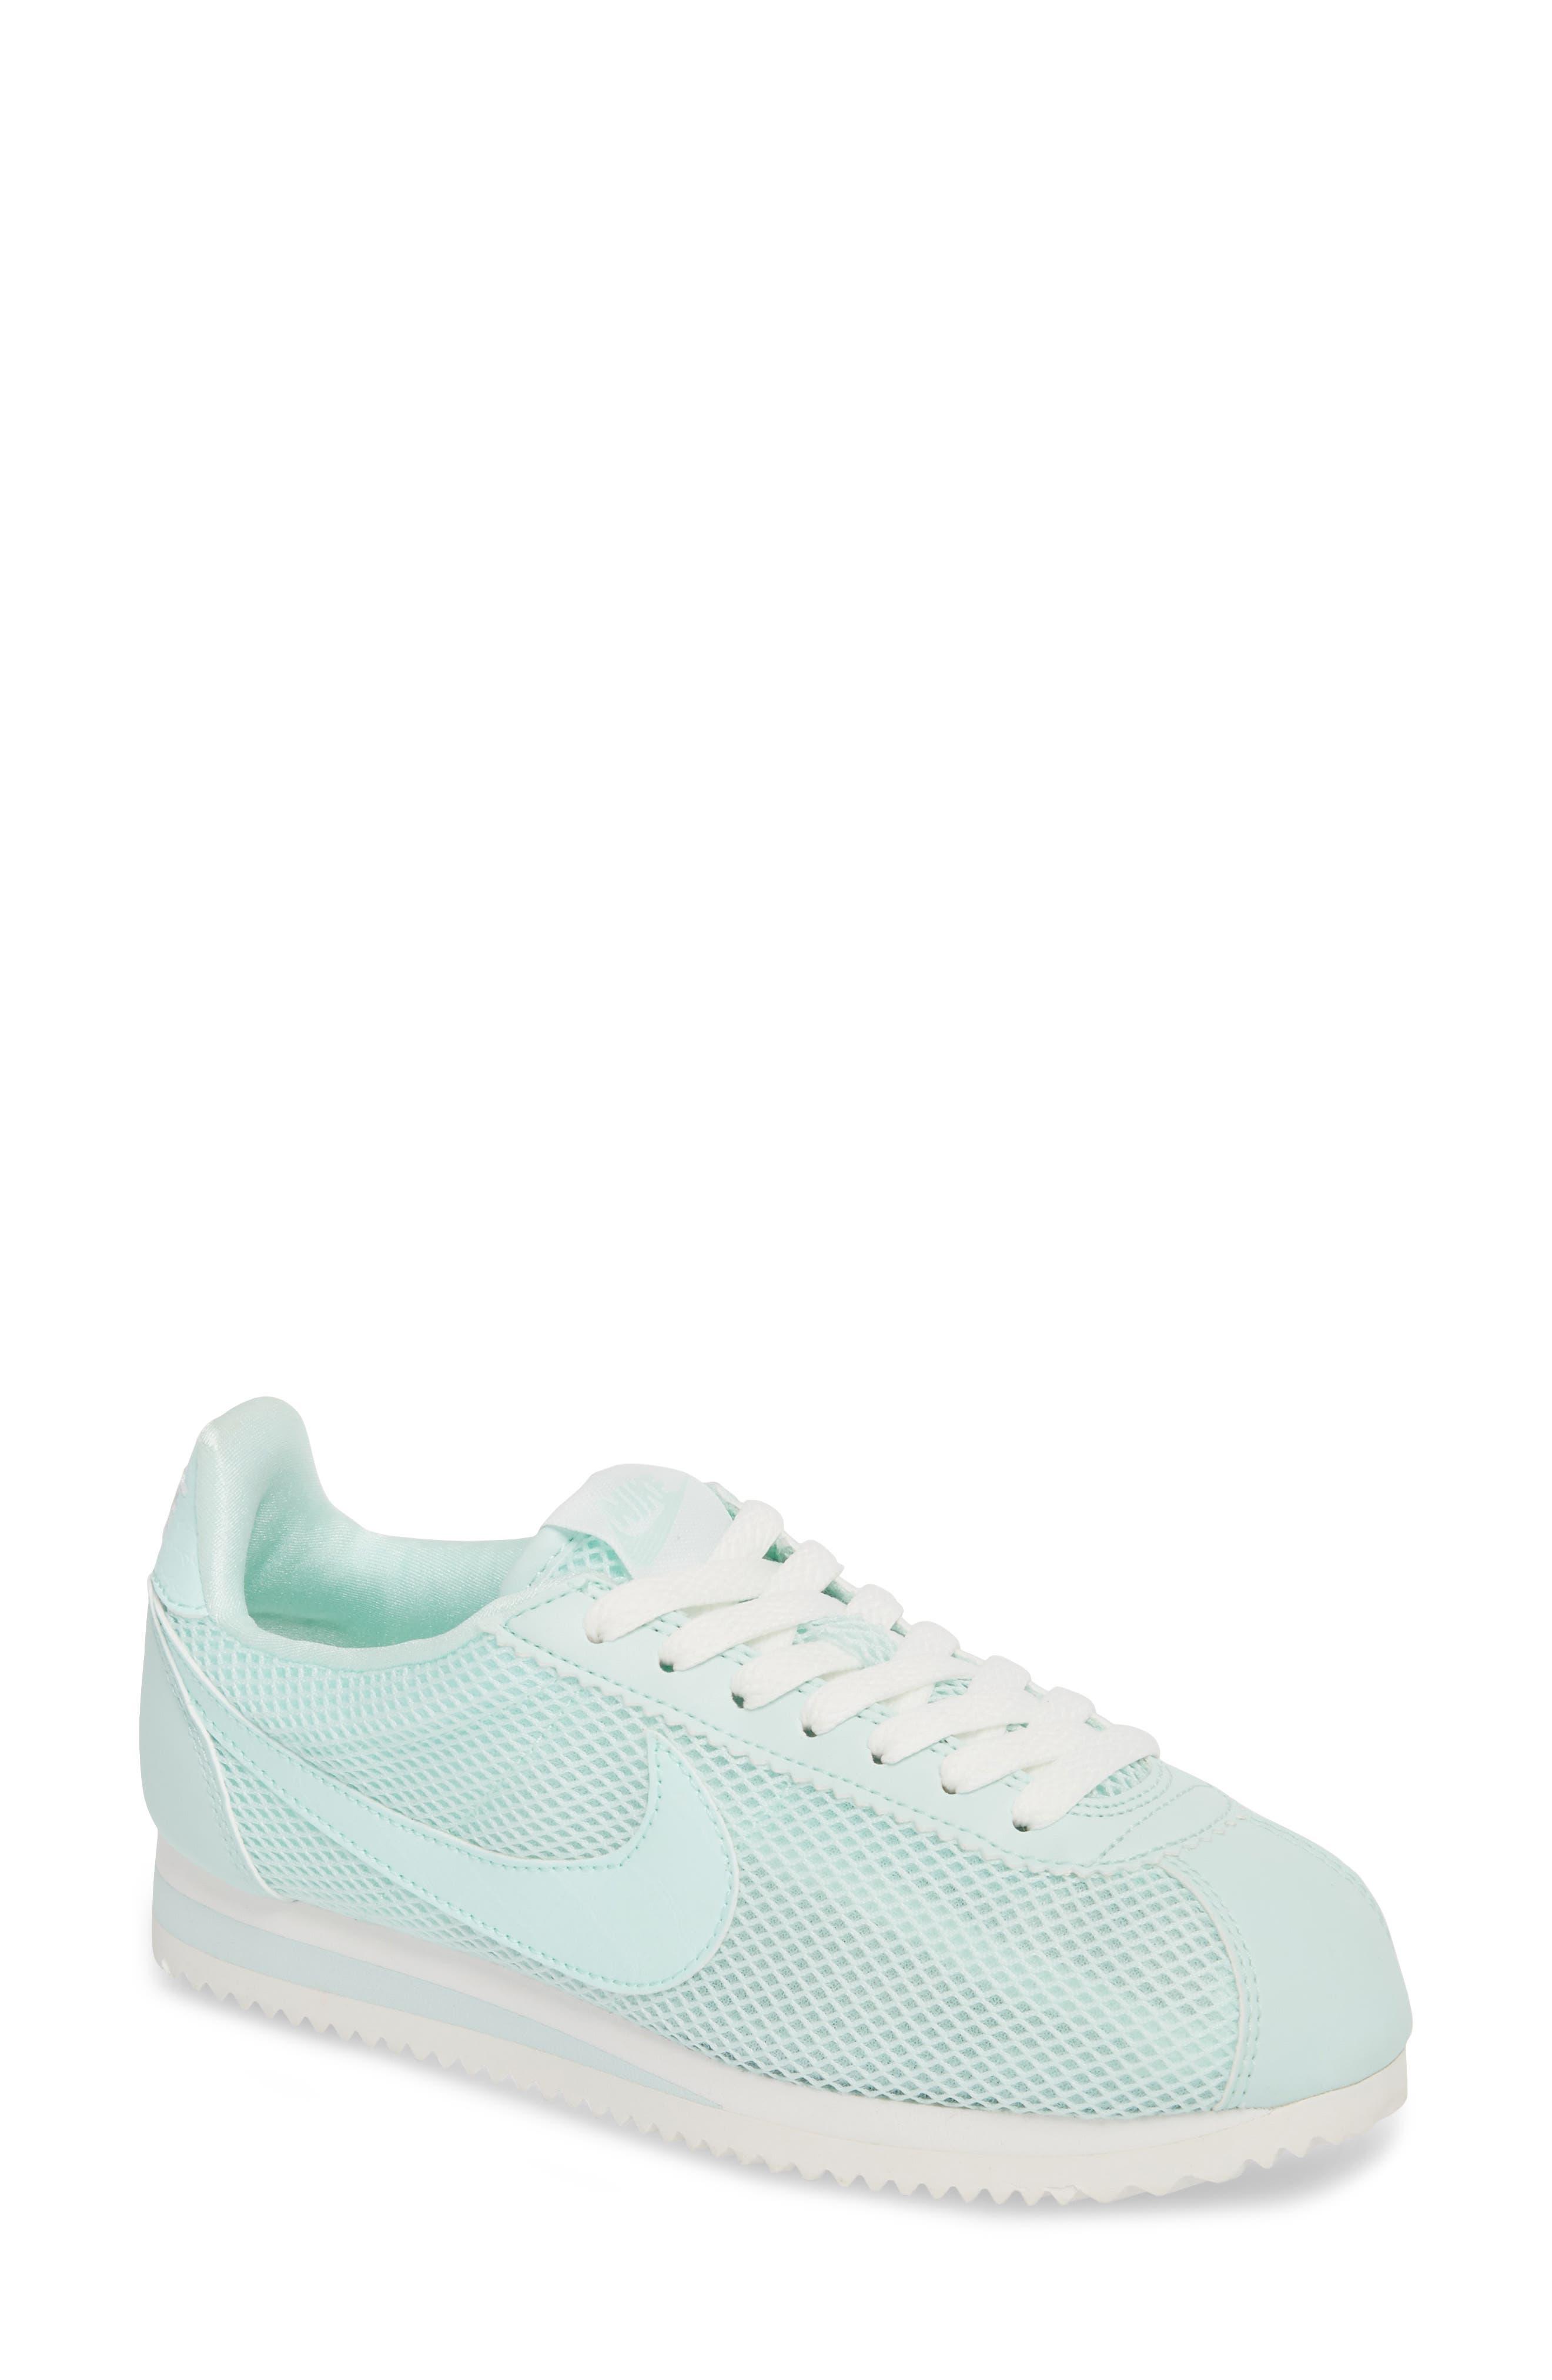 Classic Cortez Premium XLV Sneaker,                         Main,                         color, Igloo/ Igloo/ Summit White